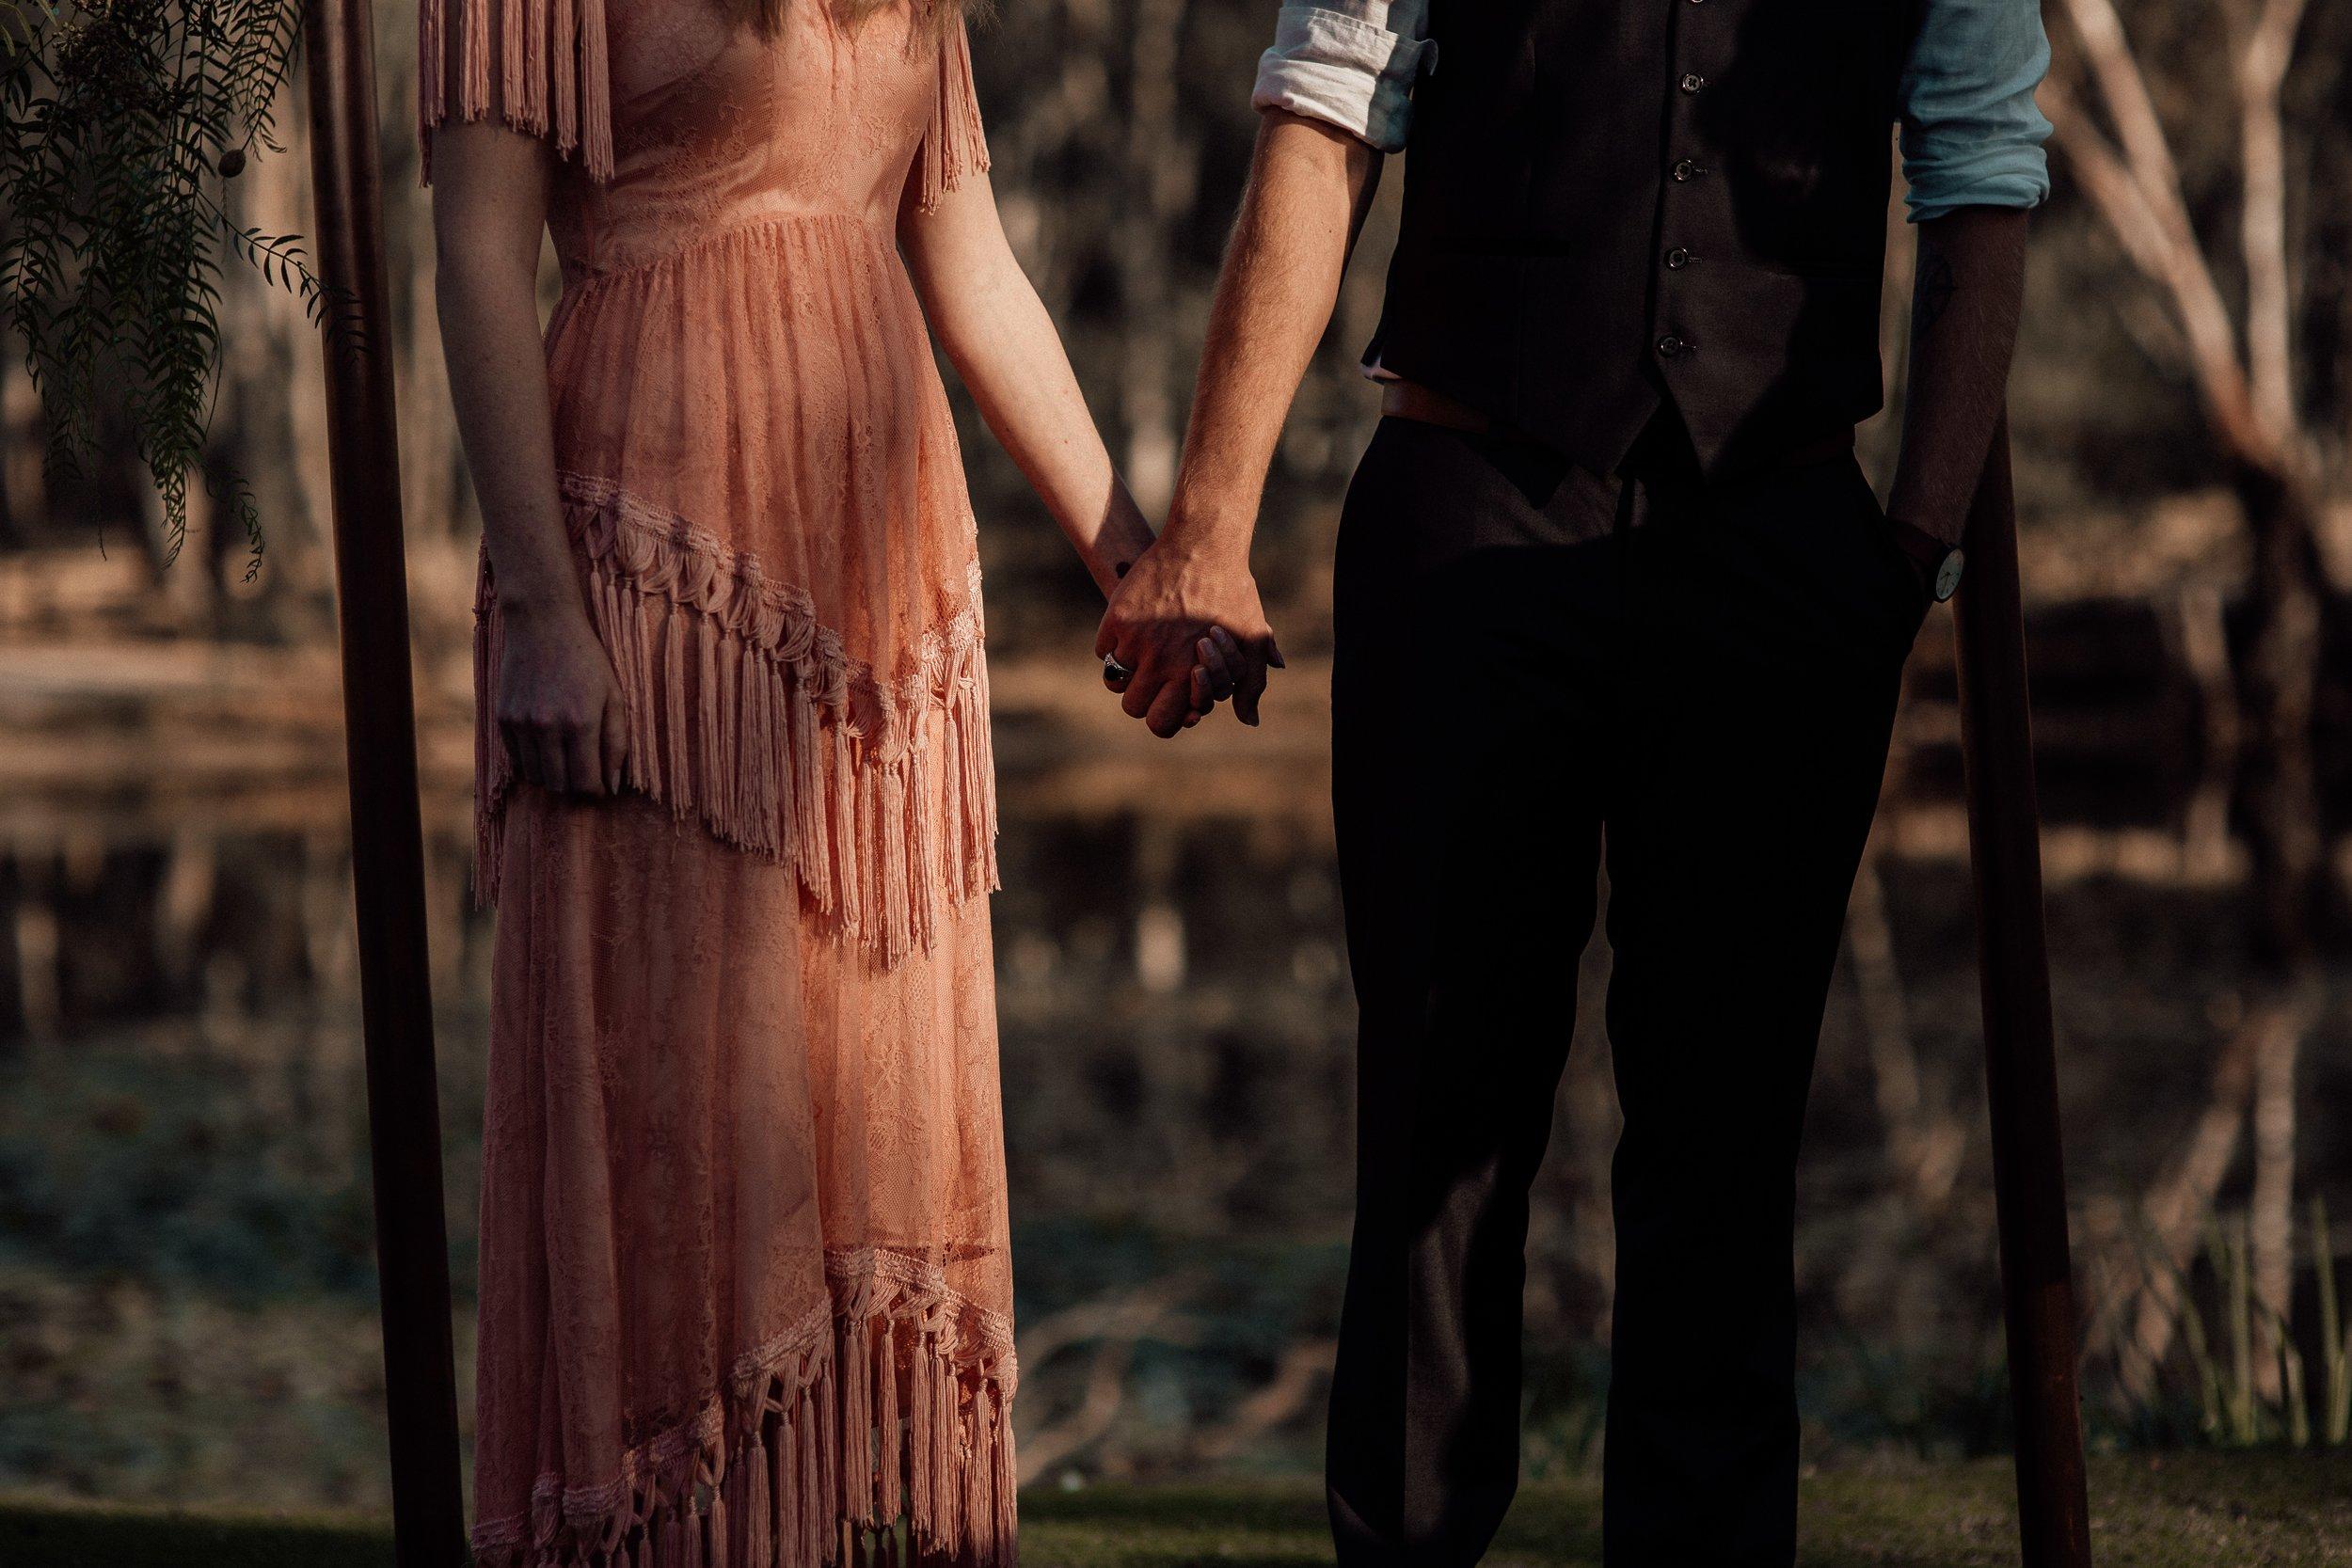 mickalathomas_puremacphotography_weddingphotographer_couplephotographer_Sheppartonphotographer_2066.jpg